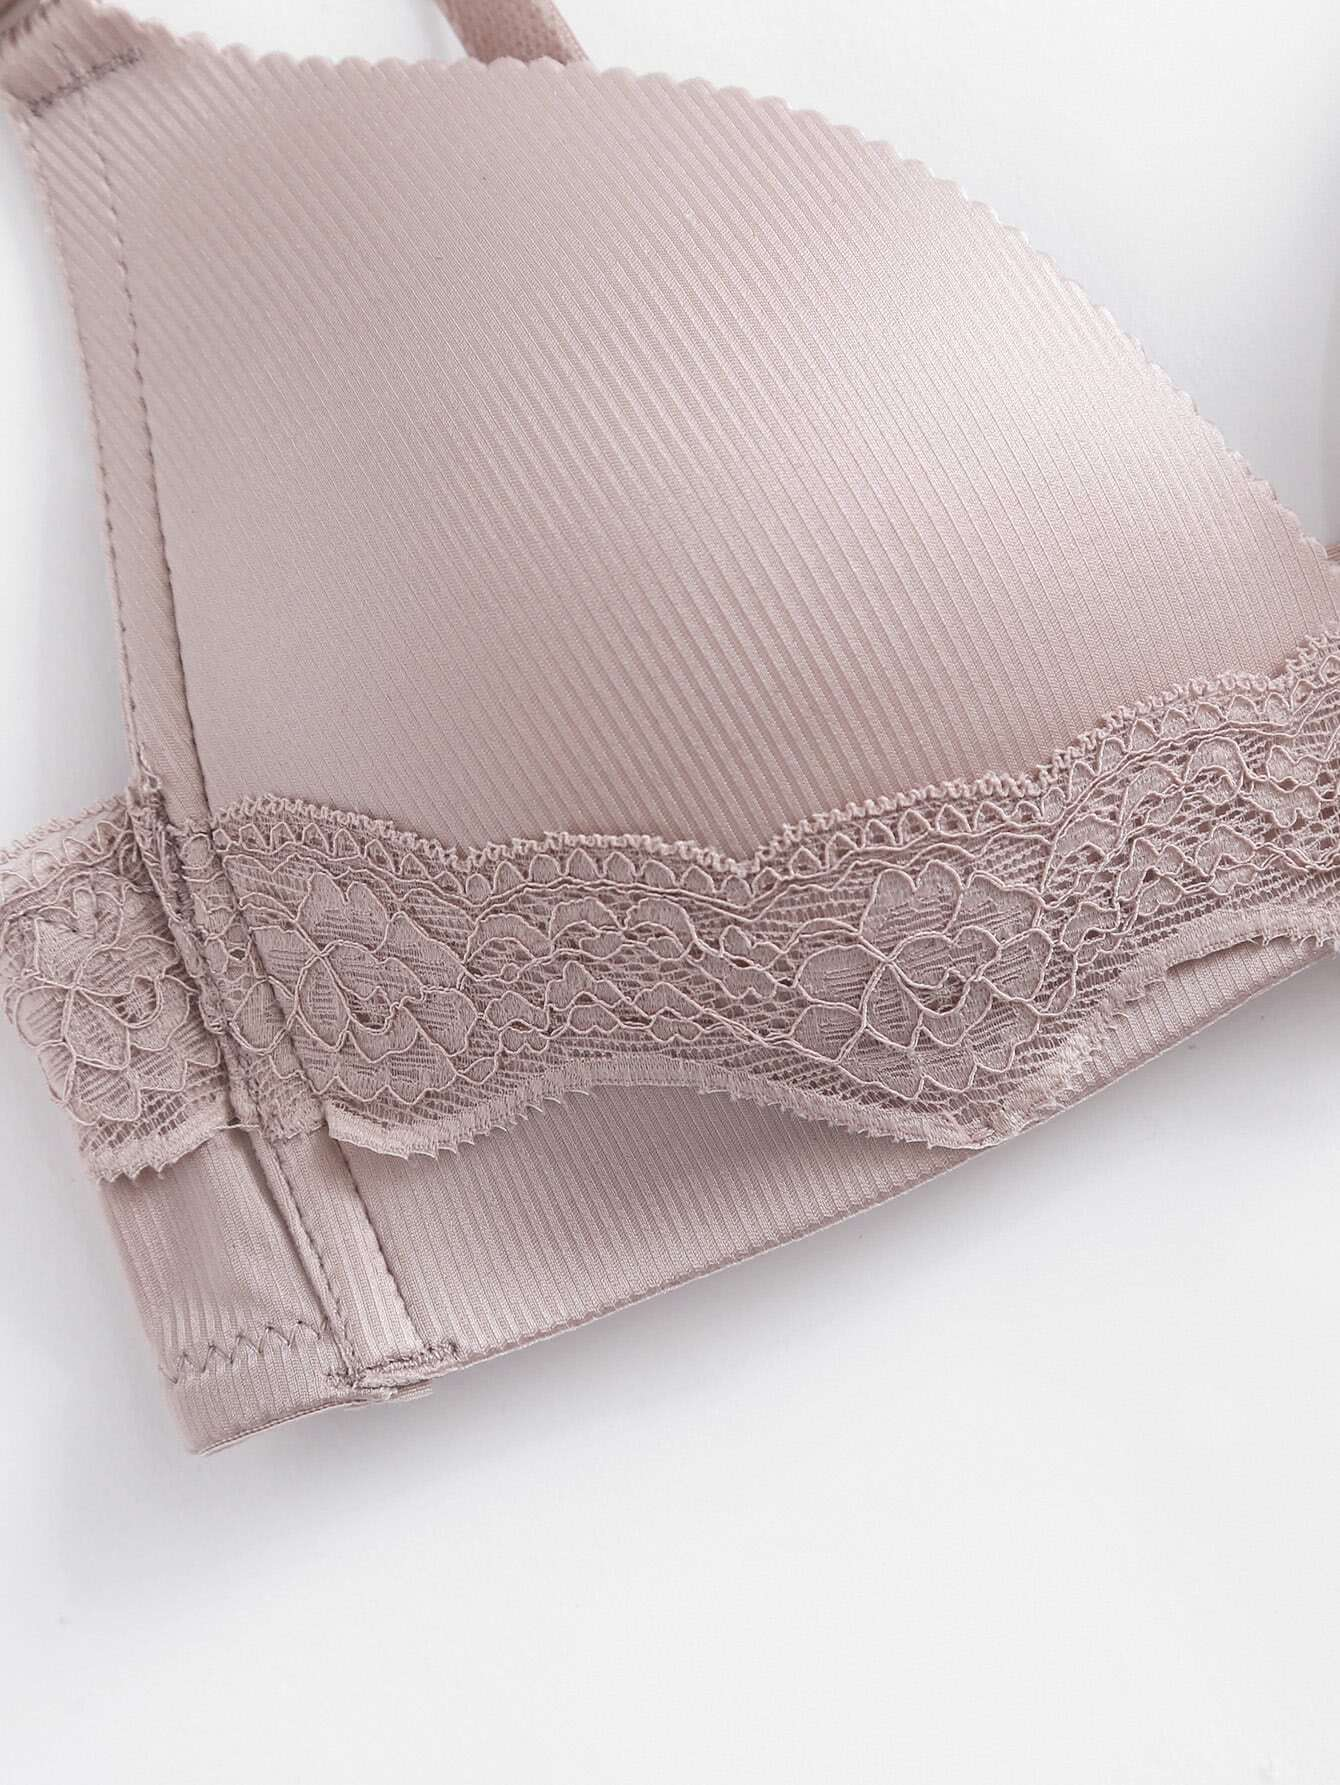 Lace Trim Adjustable Straps Bra